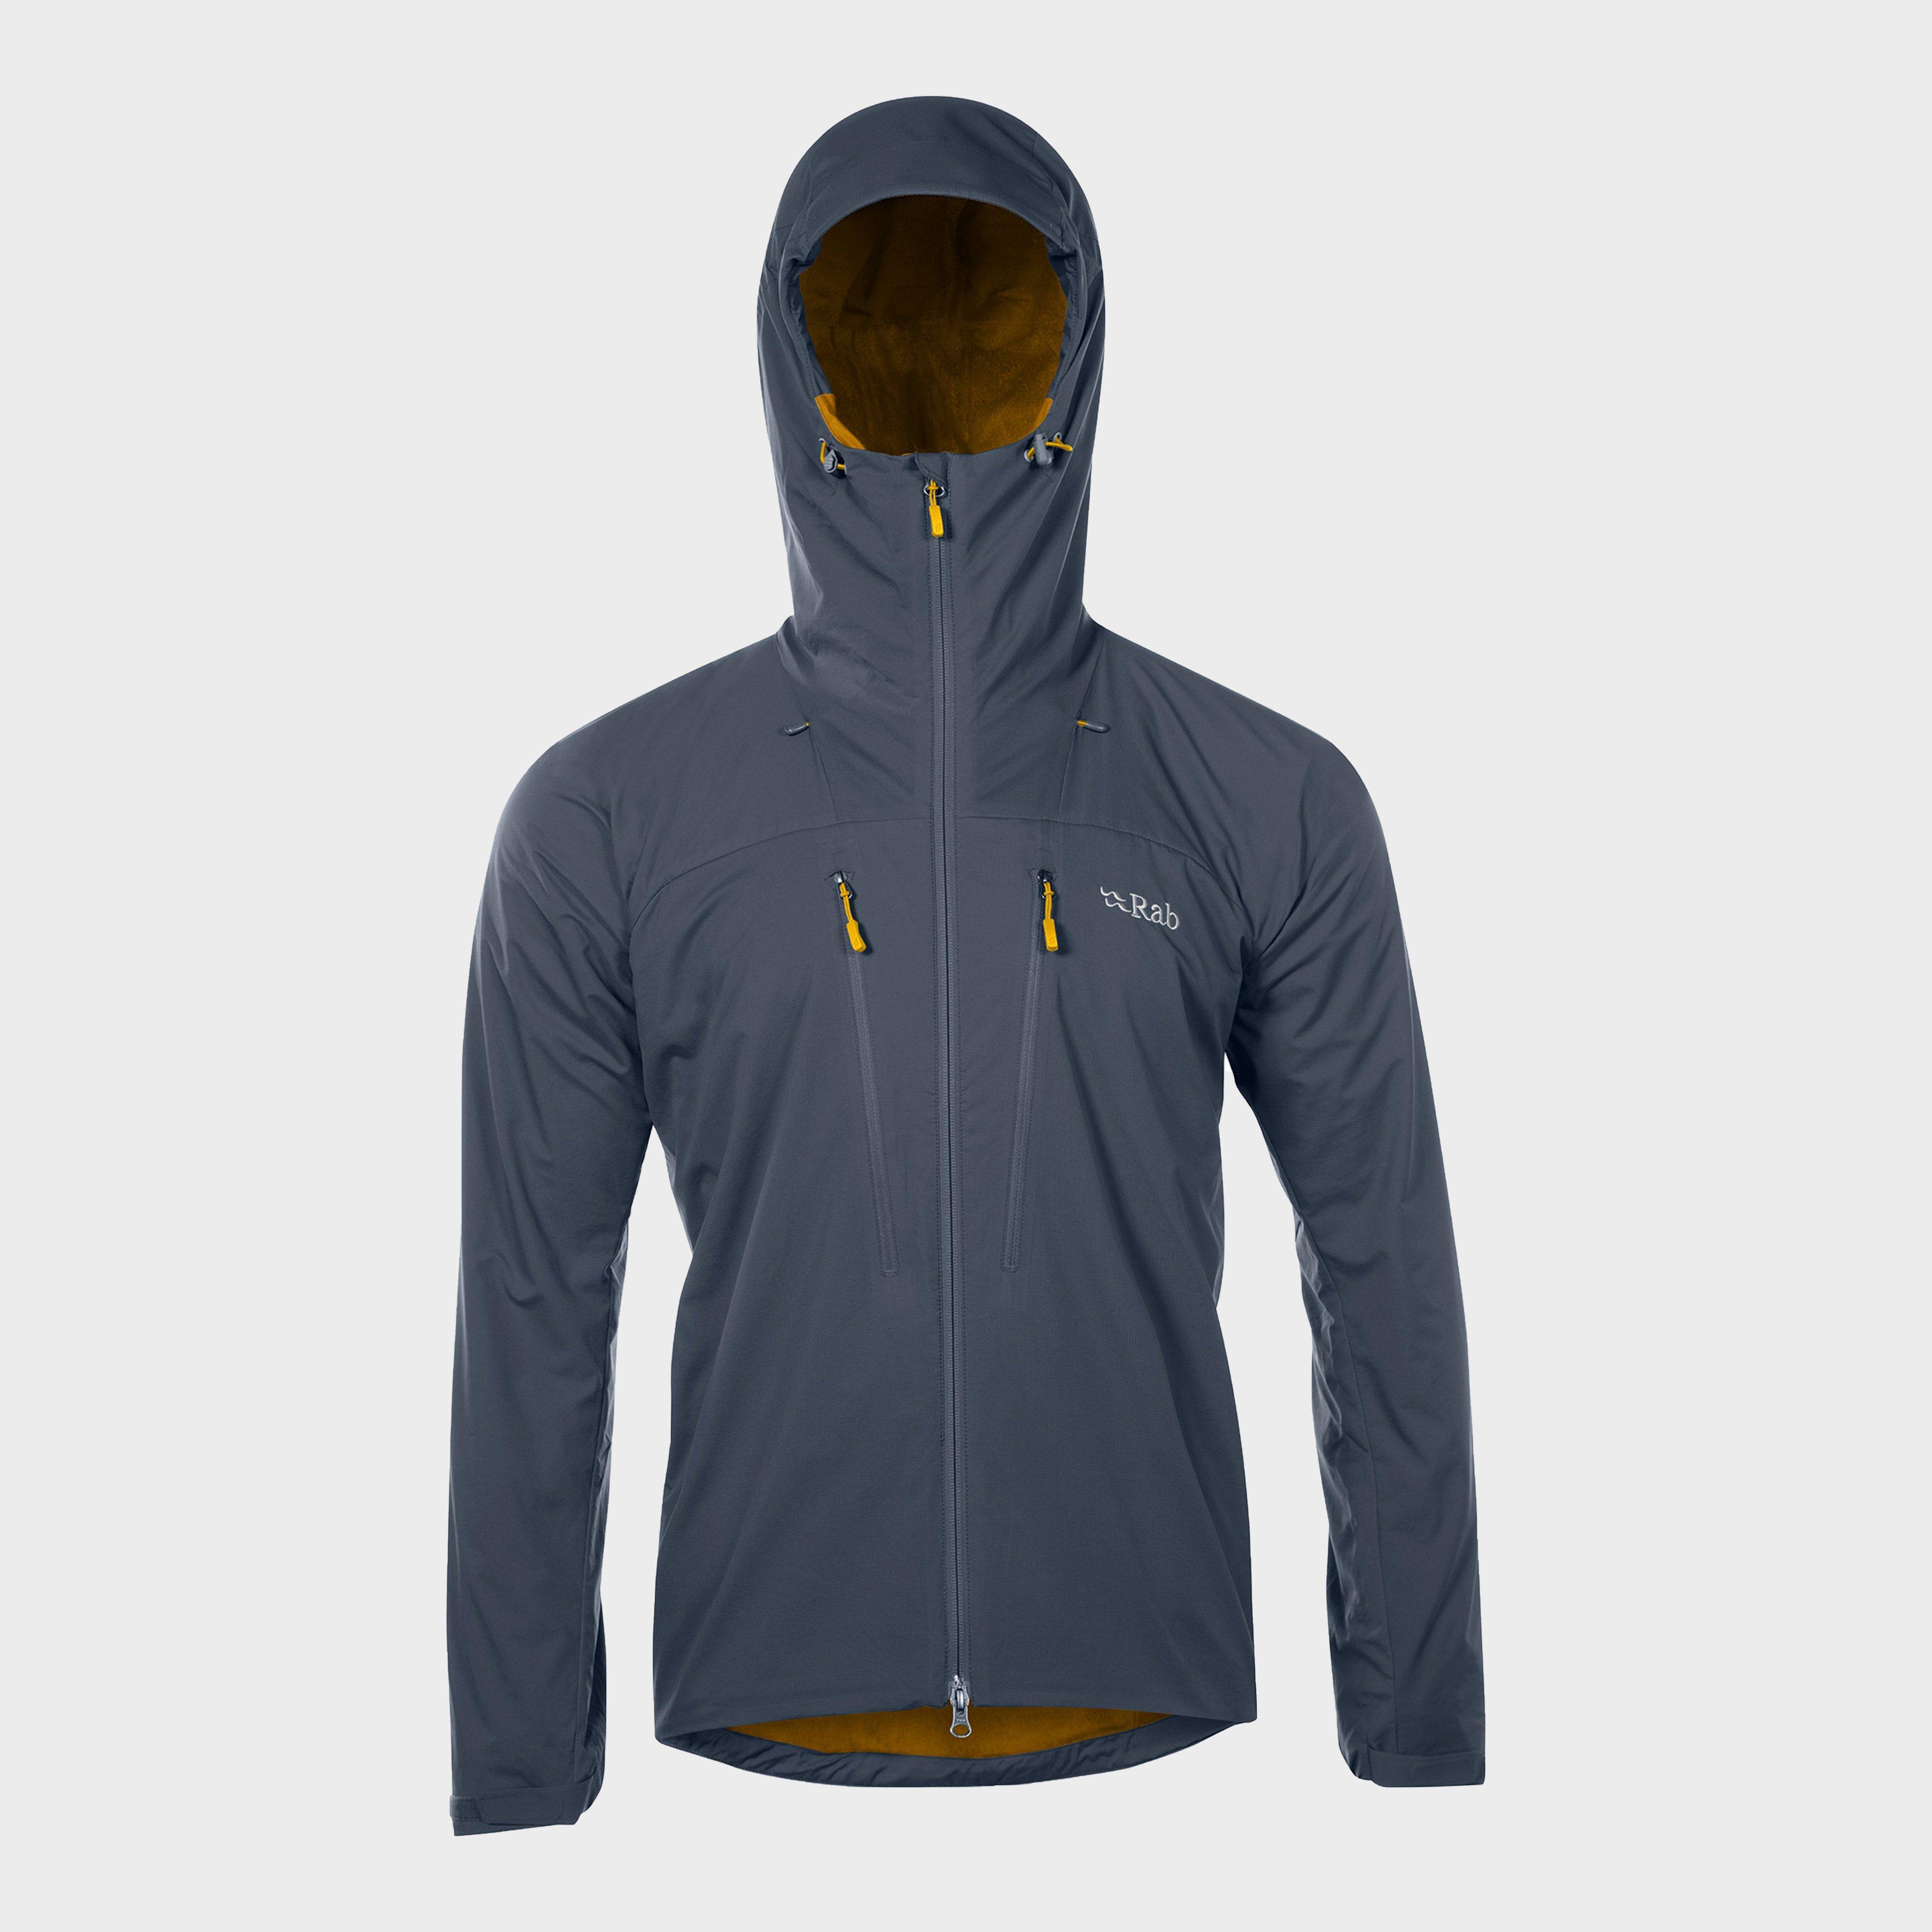 Rab Rab Mens Vapour-rise Alpine Jacket